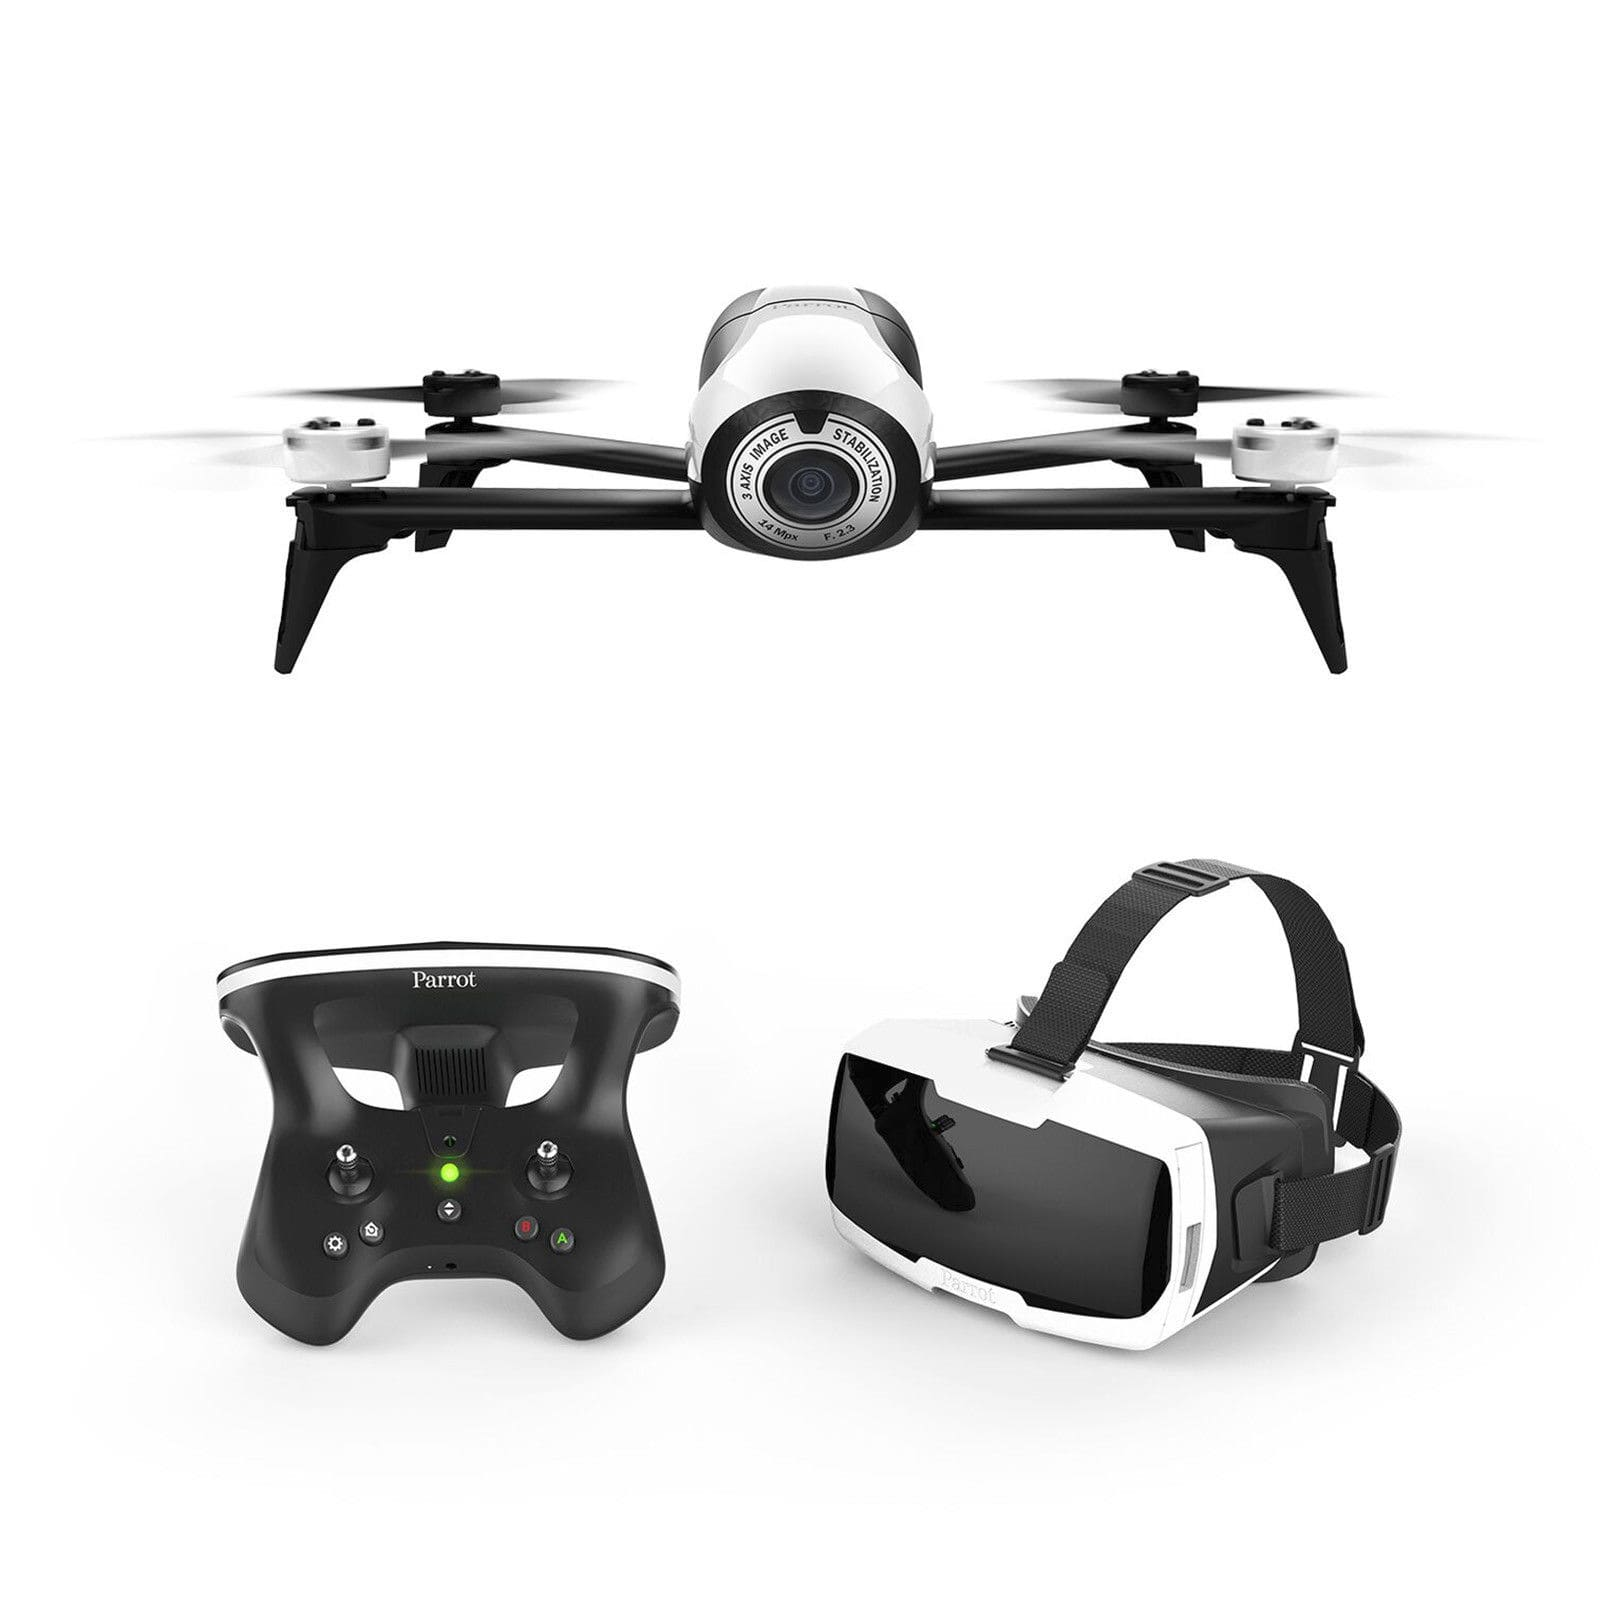 Parrot Bebop 2 FPV VR Drone Kit - Bebop 2 + Cockpitglasses + Skycontroller 2 $229.99